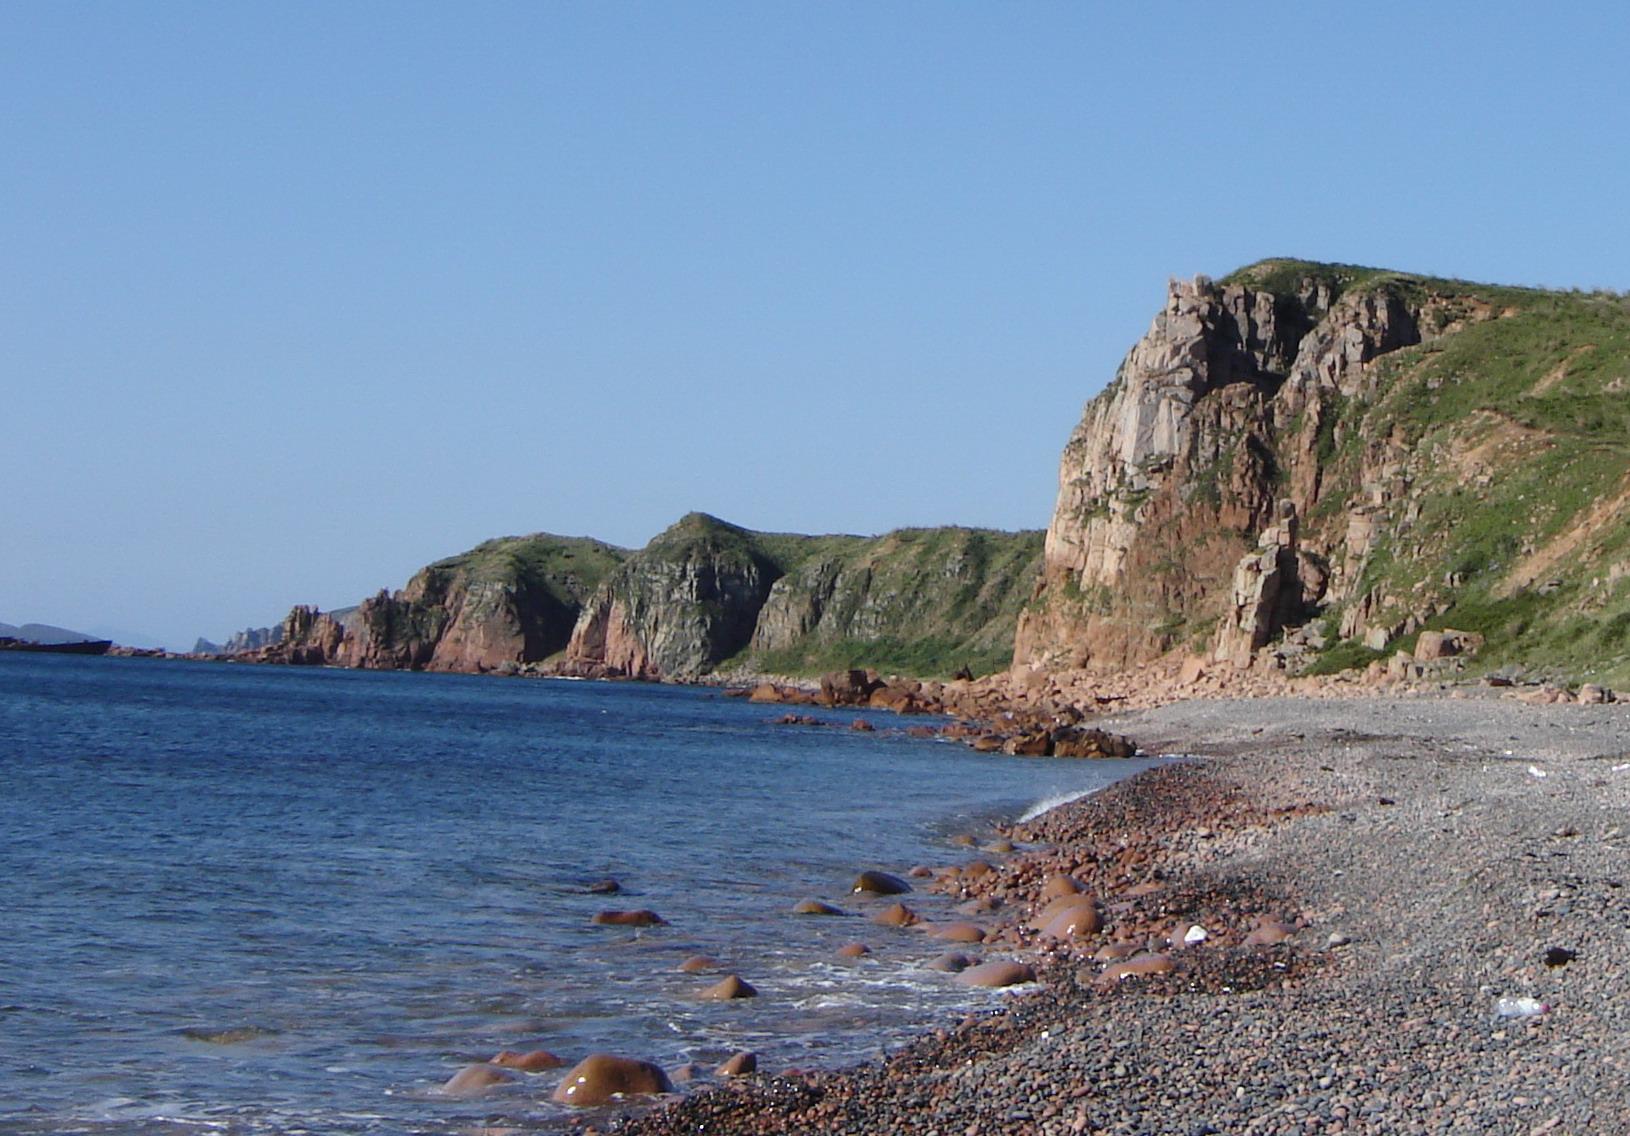 Reyneke Island RW0MM/P